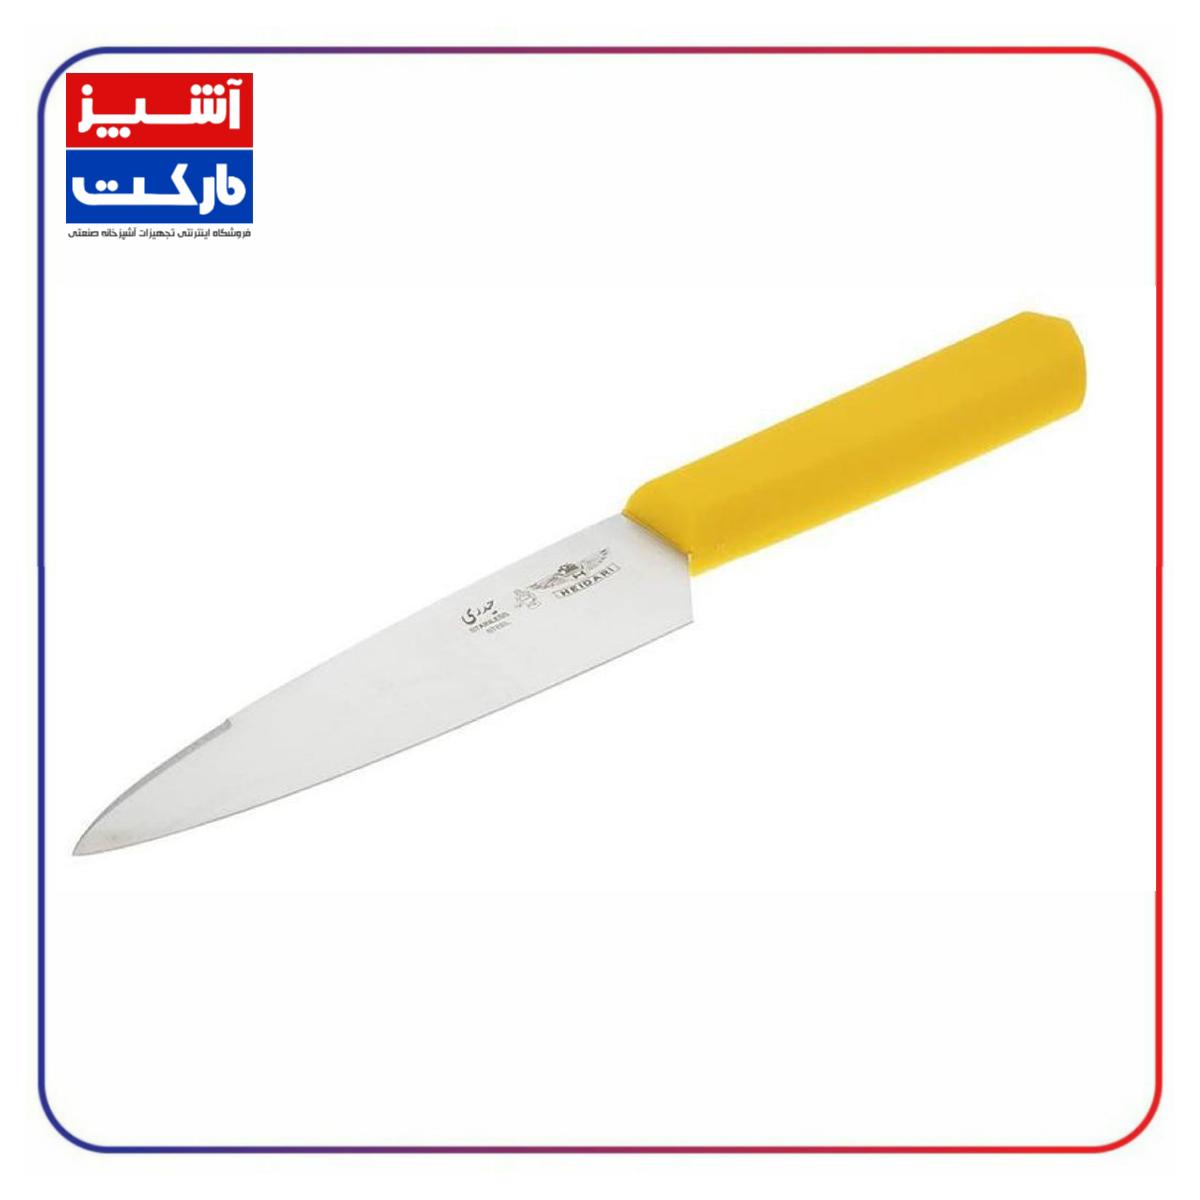 چاقو حیدری راسته ای دسته پلاستیک سایز 1